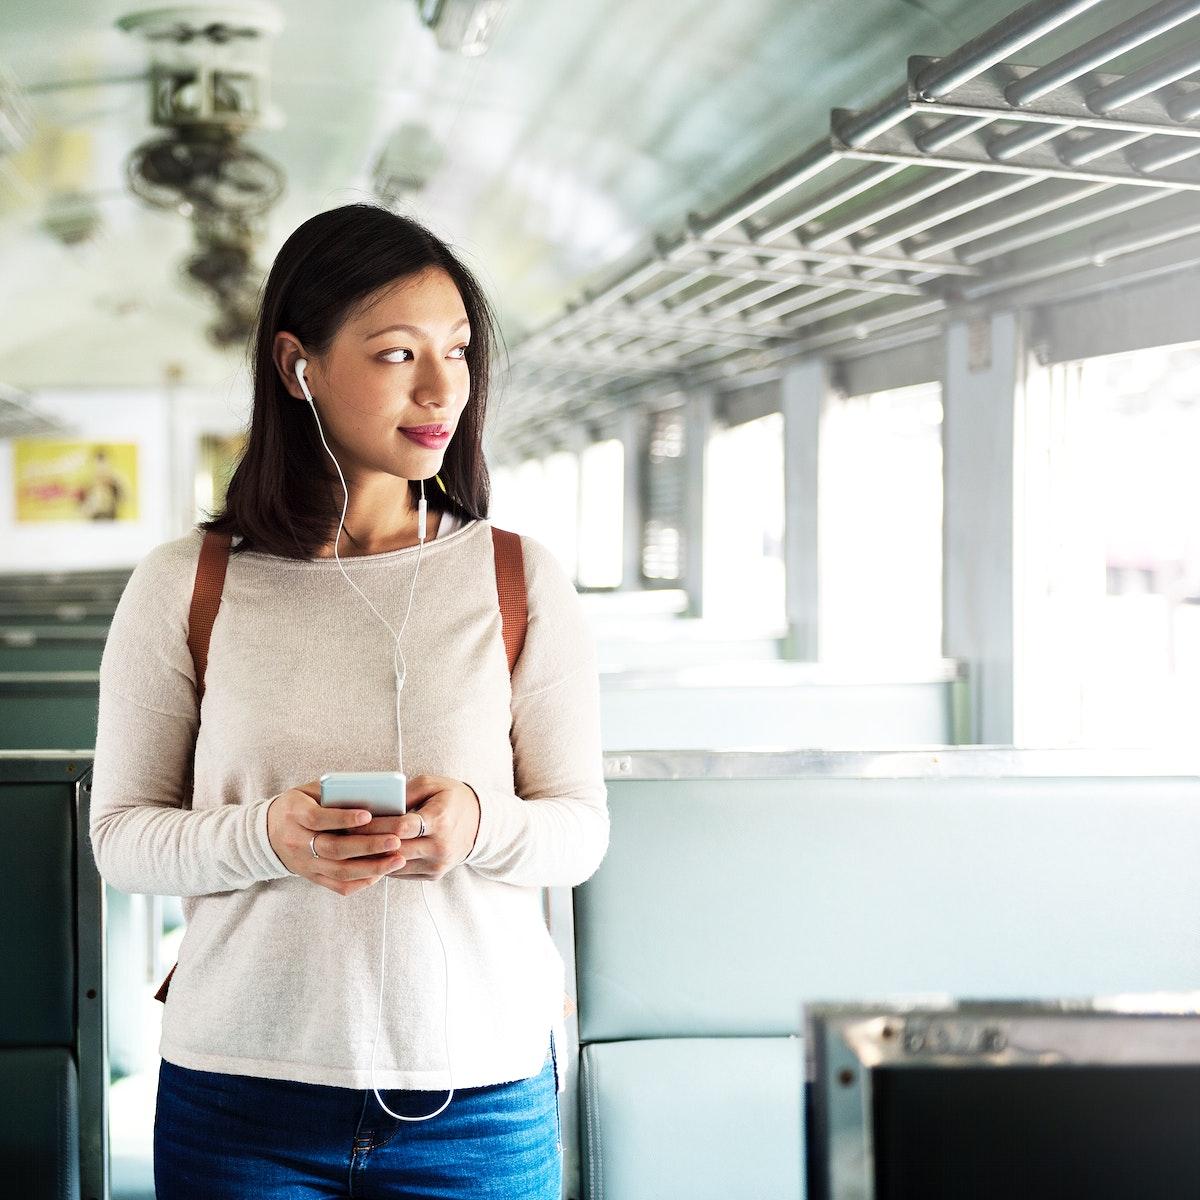 Asian woman riding a train